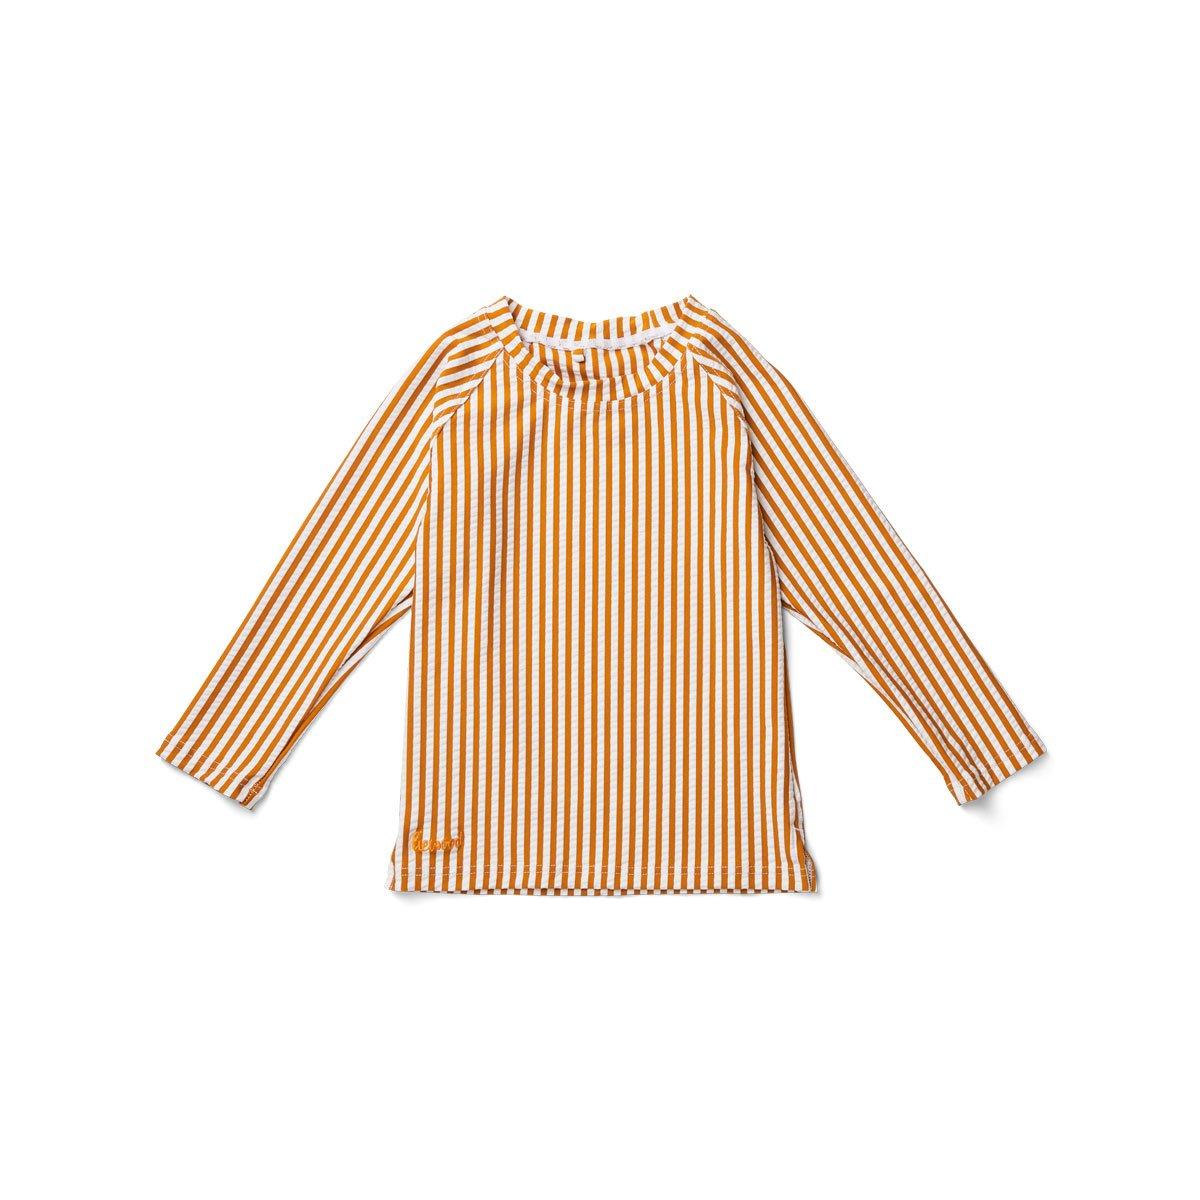 Liewood - Noah Swim Tee Stripe/Mustard